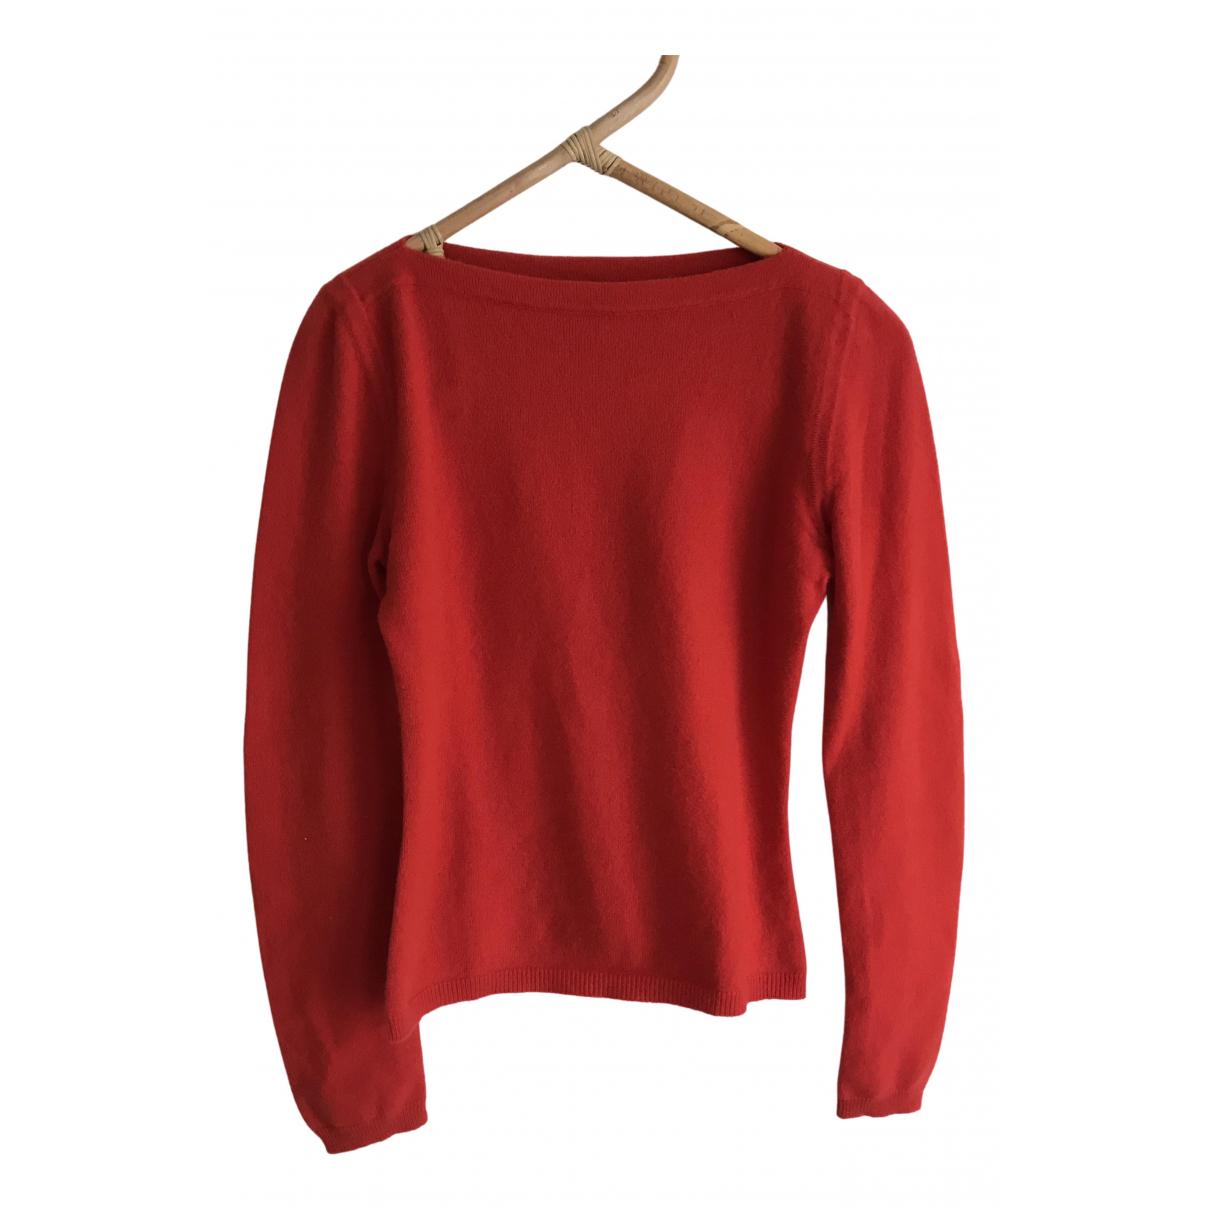 Strenesse - Pull   pour femme en cachemire - rouge